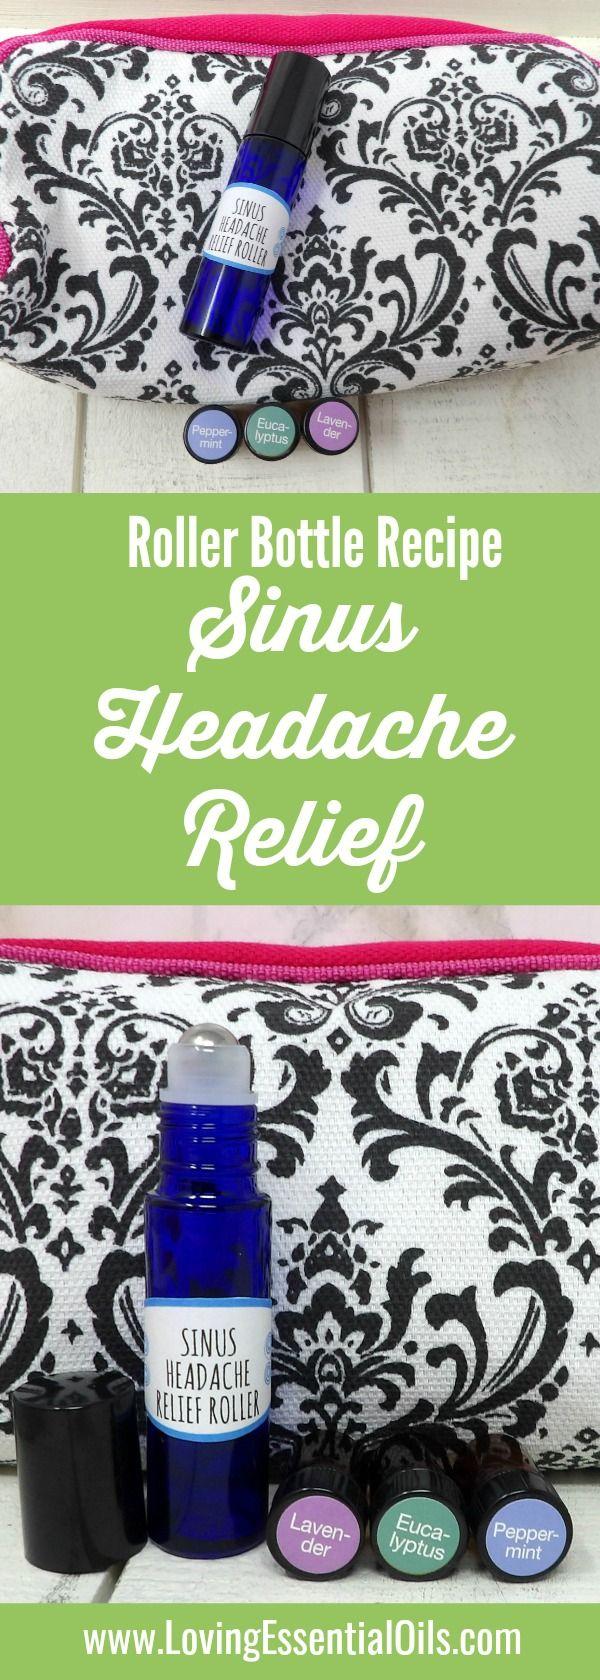 DIY RECIPES - Essential Oils For Sinus Headache Relief - Roller Bottle Recipe | Loving Essential Oils #sinusheadache #essentialoilrecipes #DIYrecipes